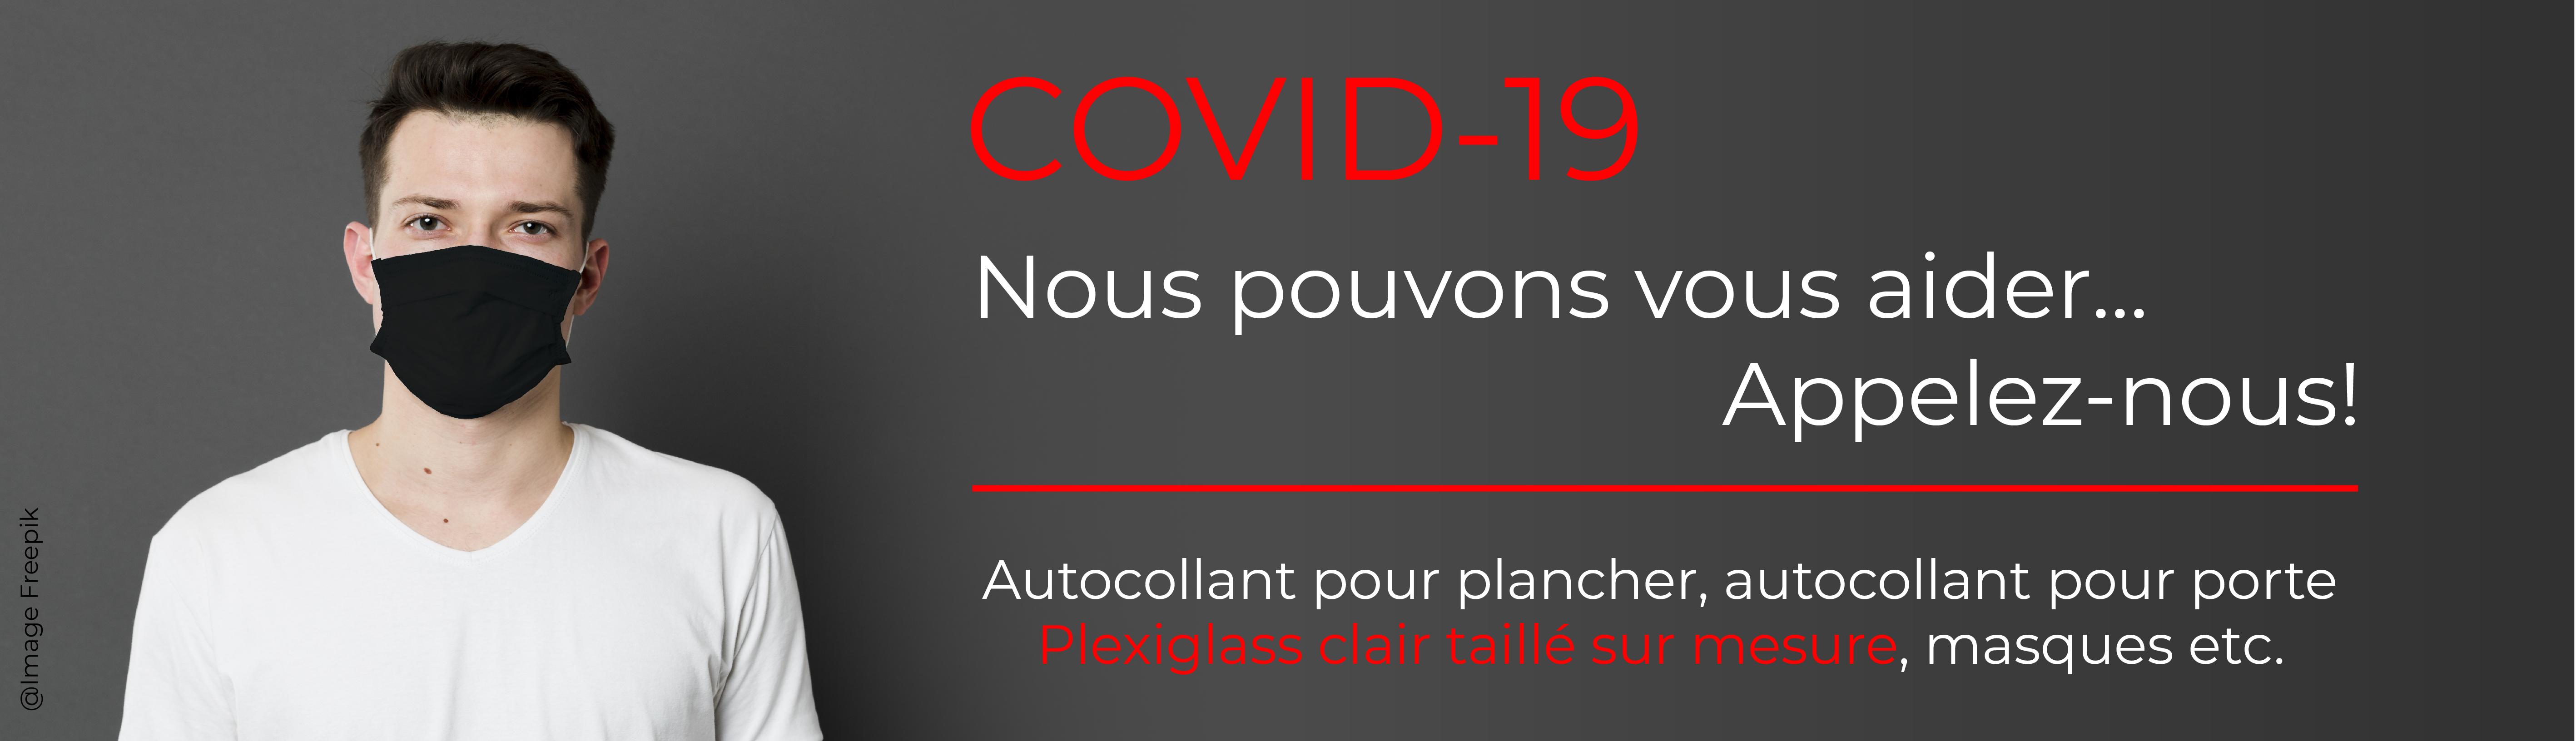 Feuille-pub-Covid-19-2-01